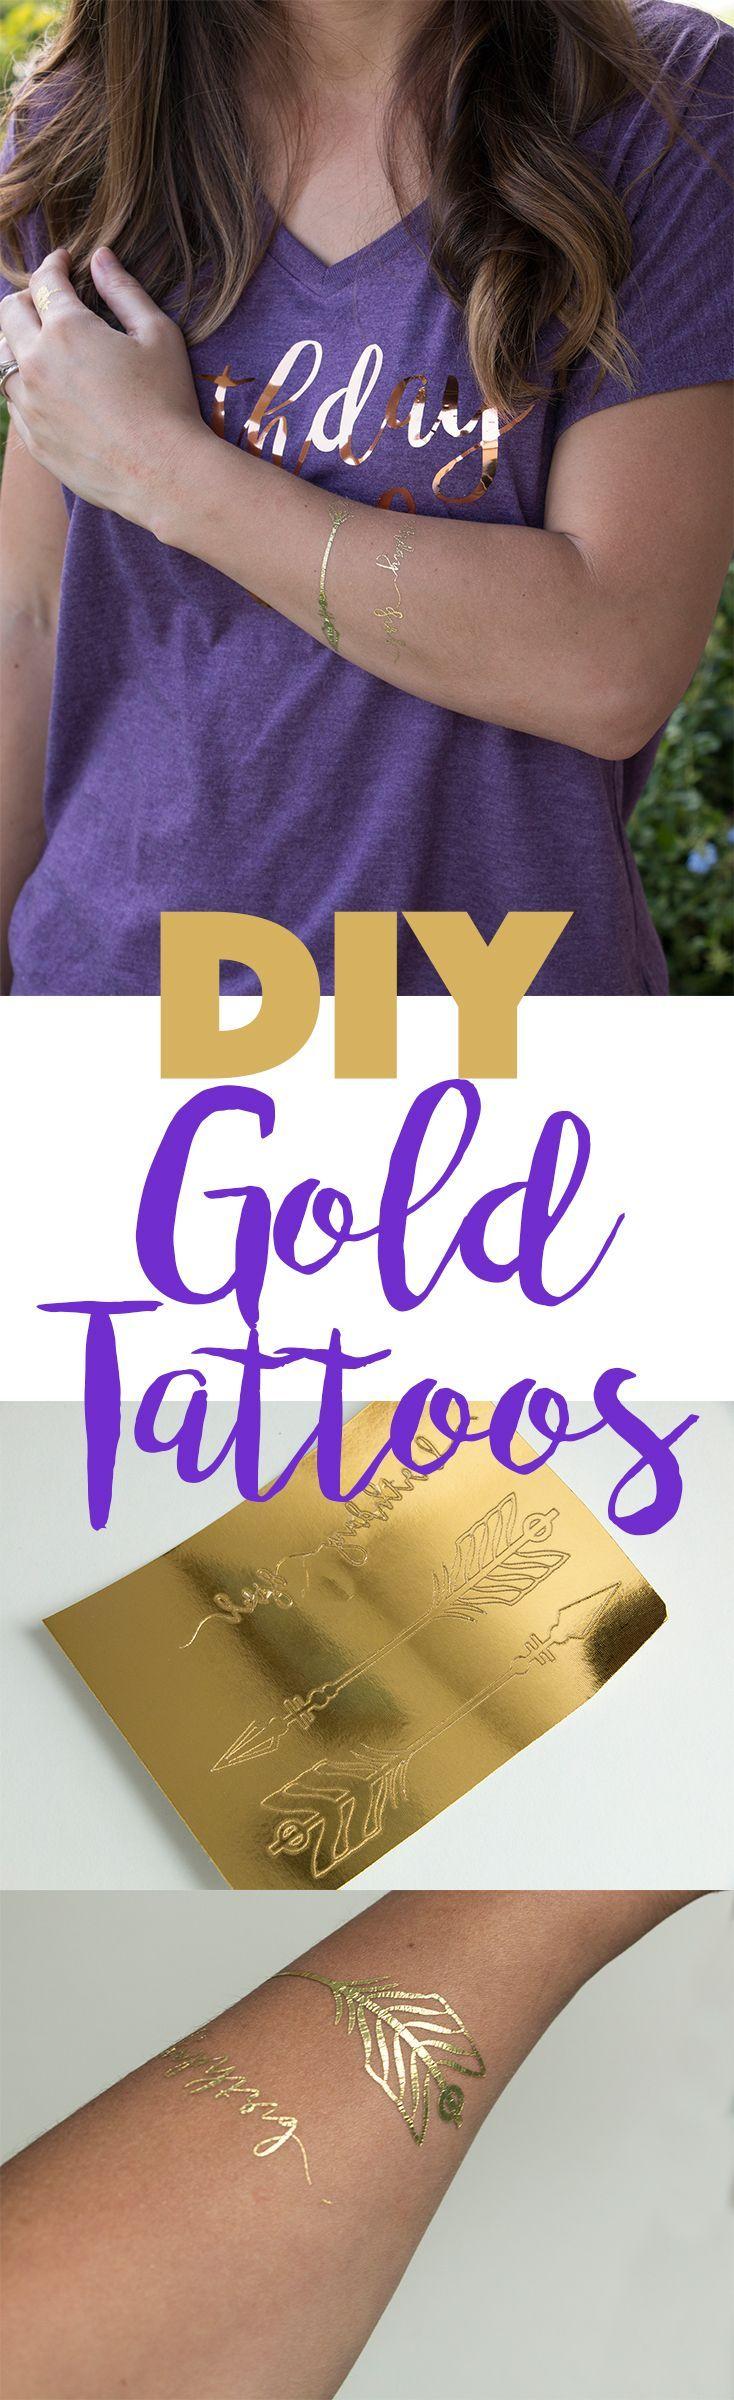 DIY Metallic Gold Temporary Tattoos! No more buying them.